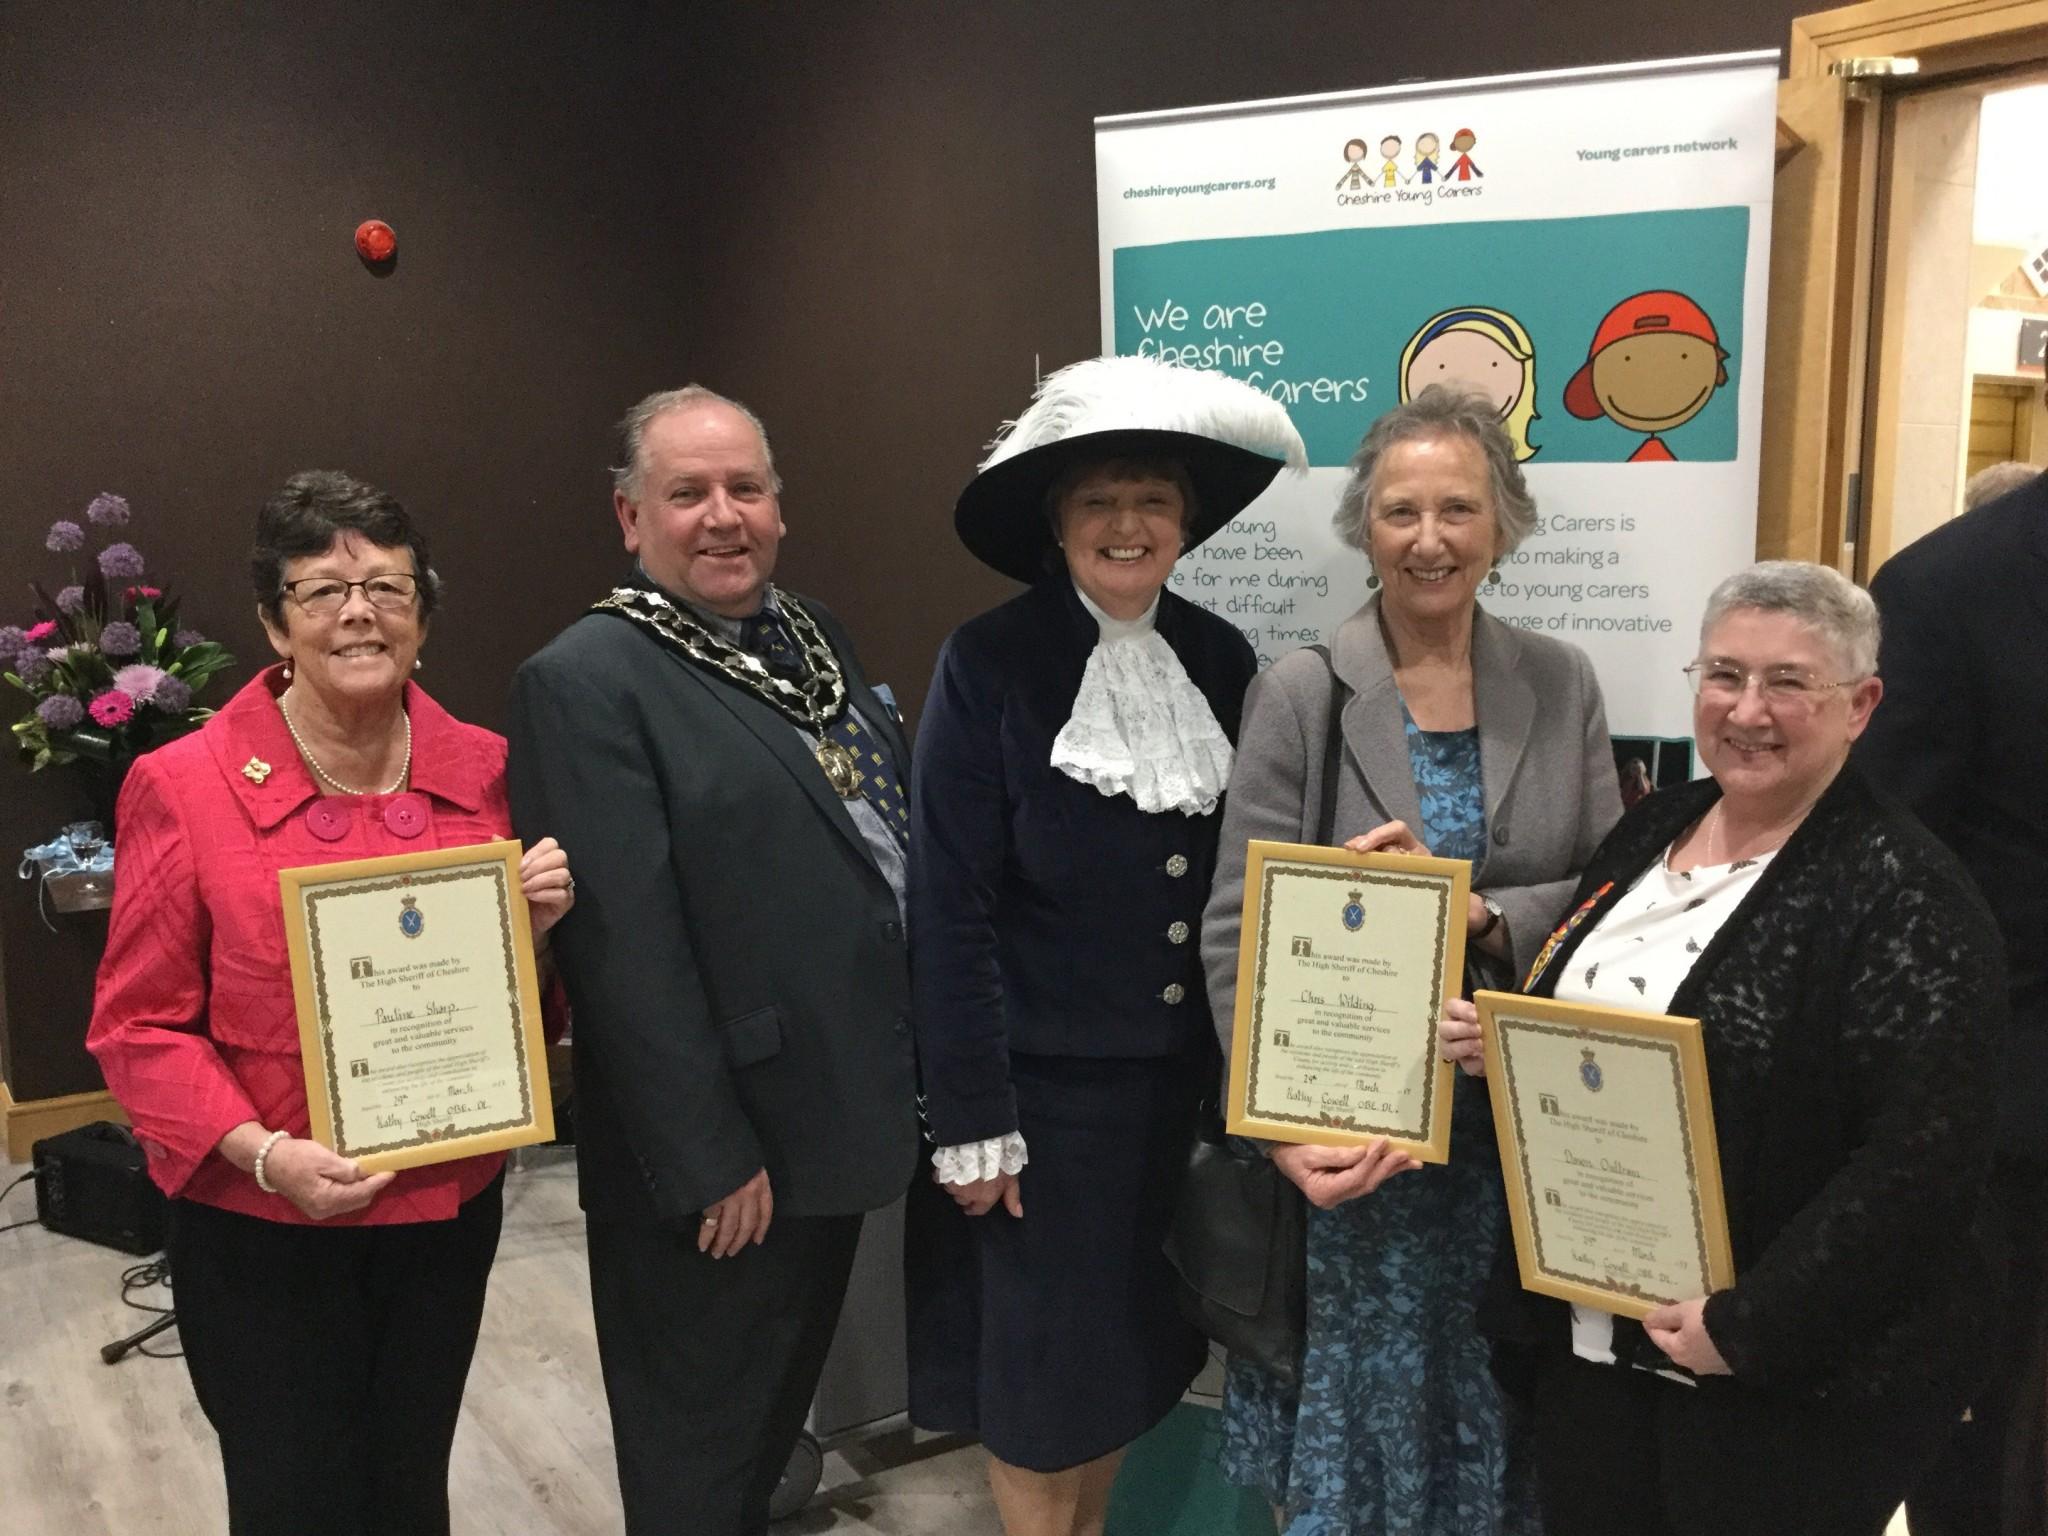 Photo of awards ceremony